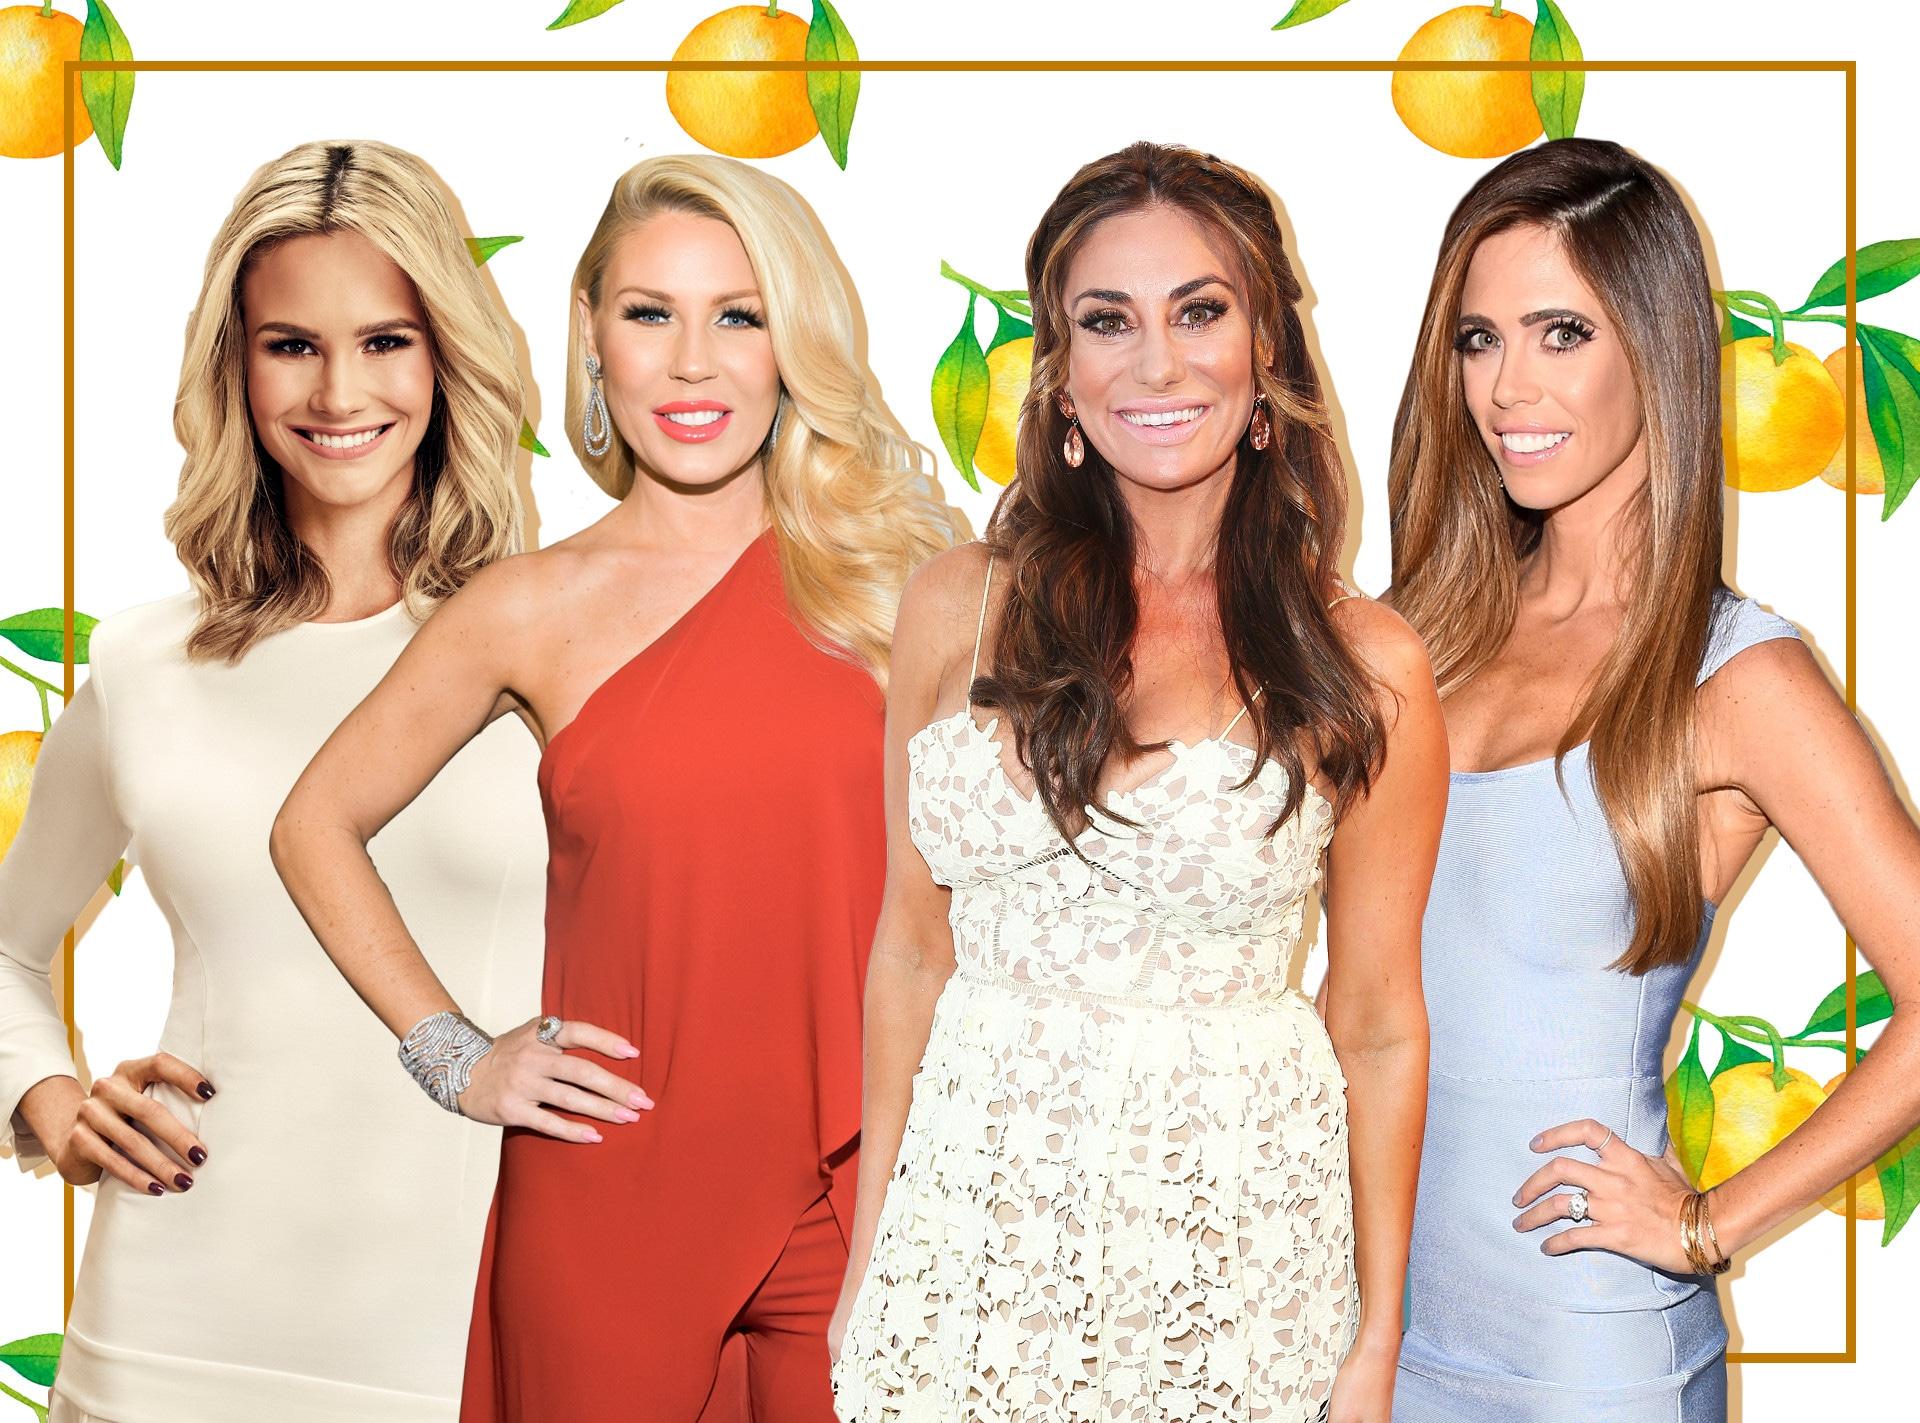 Real Housewives of Orange County, RHOC, Meghan King Edmonds, Gretchen Rossi, Lydia McLaughlin, Lizzie Rovsek